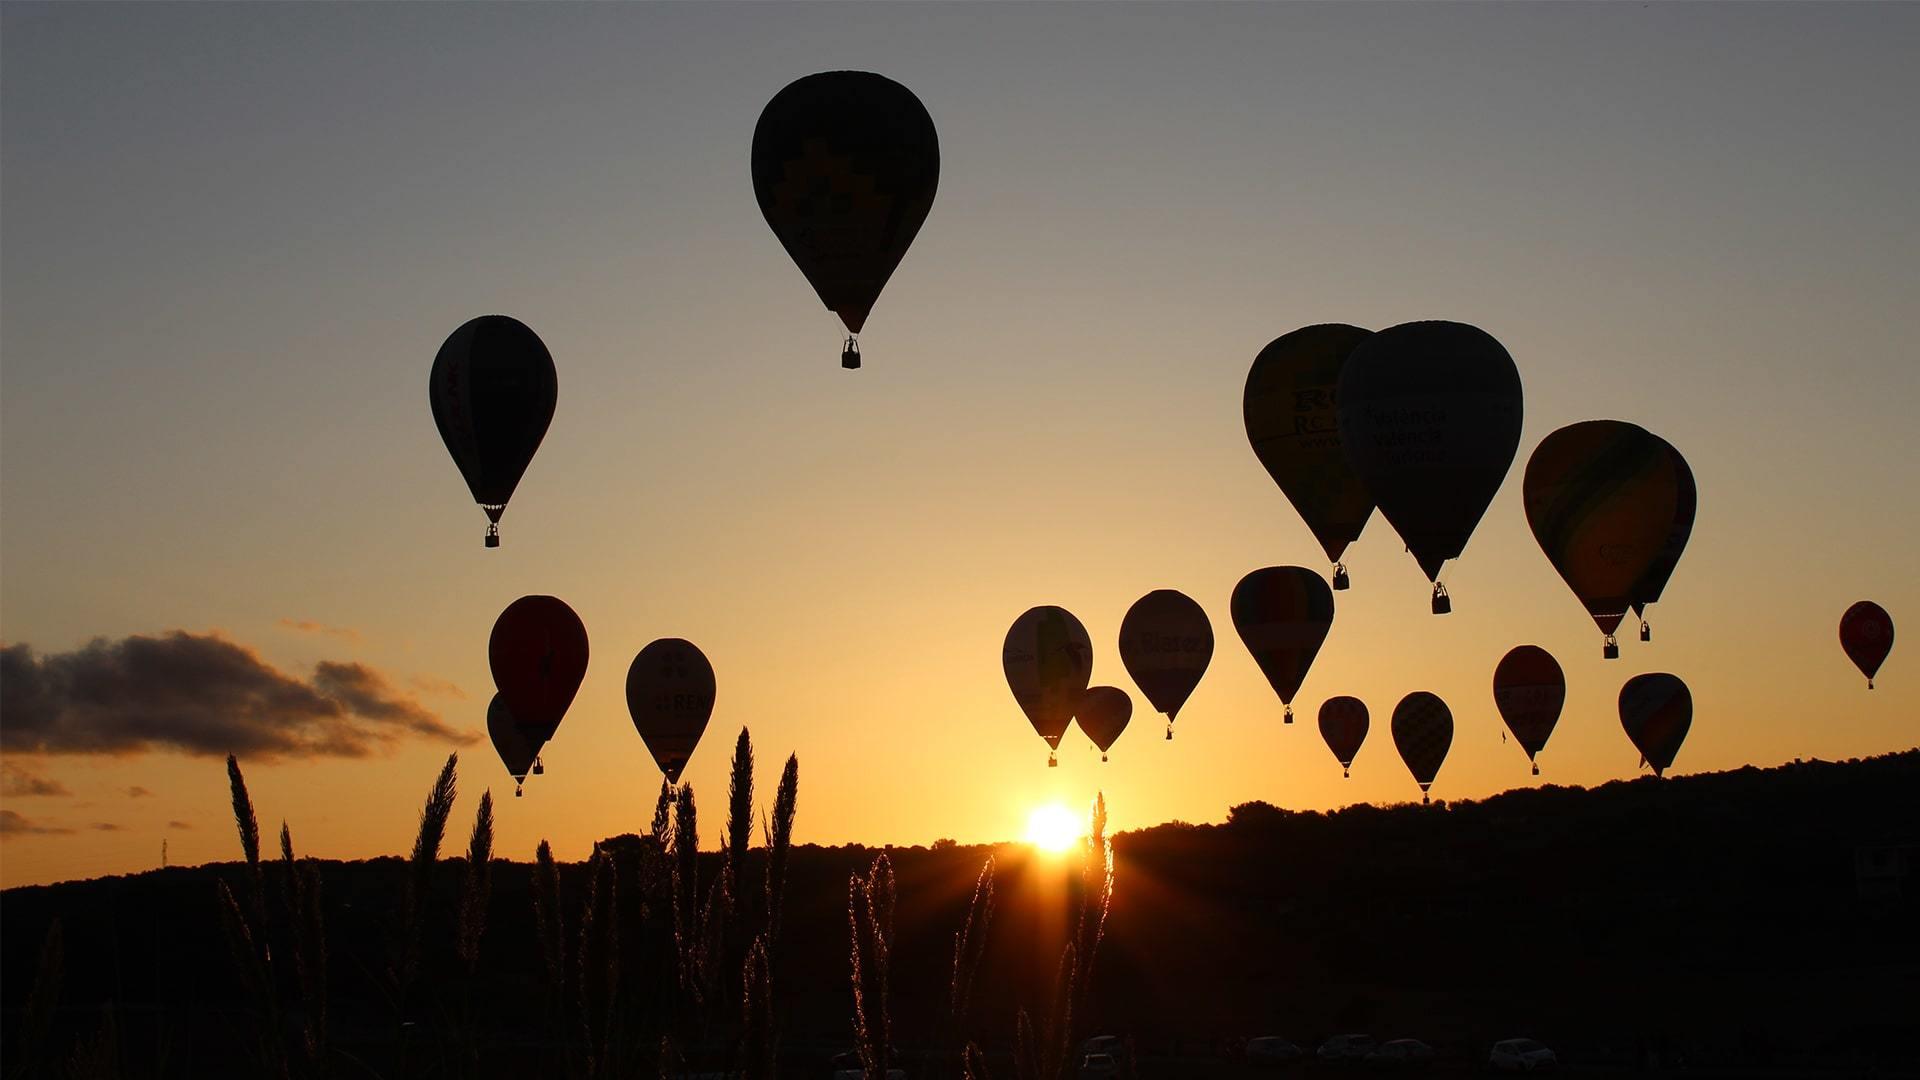 Beautiful sunrise hot air balloons mallorca photo Adele Chretien min